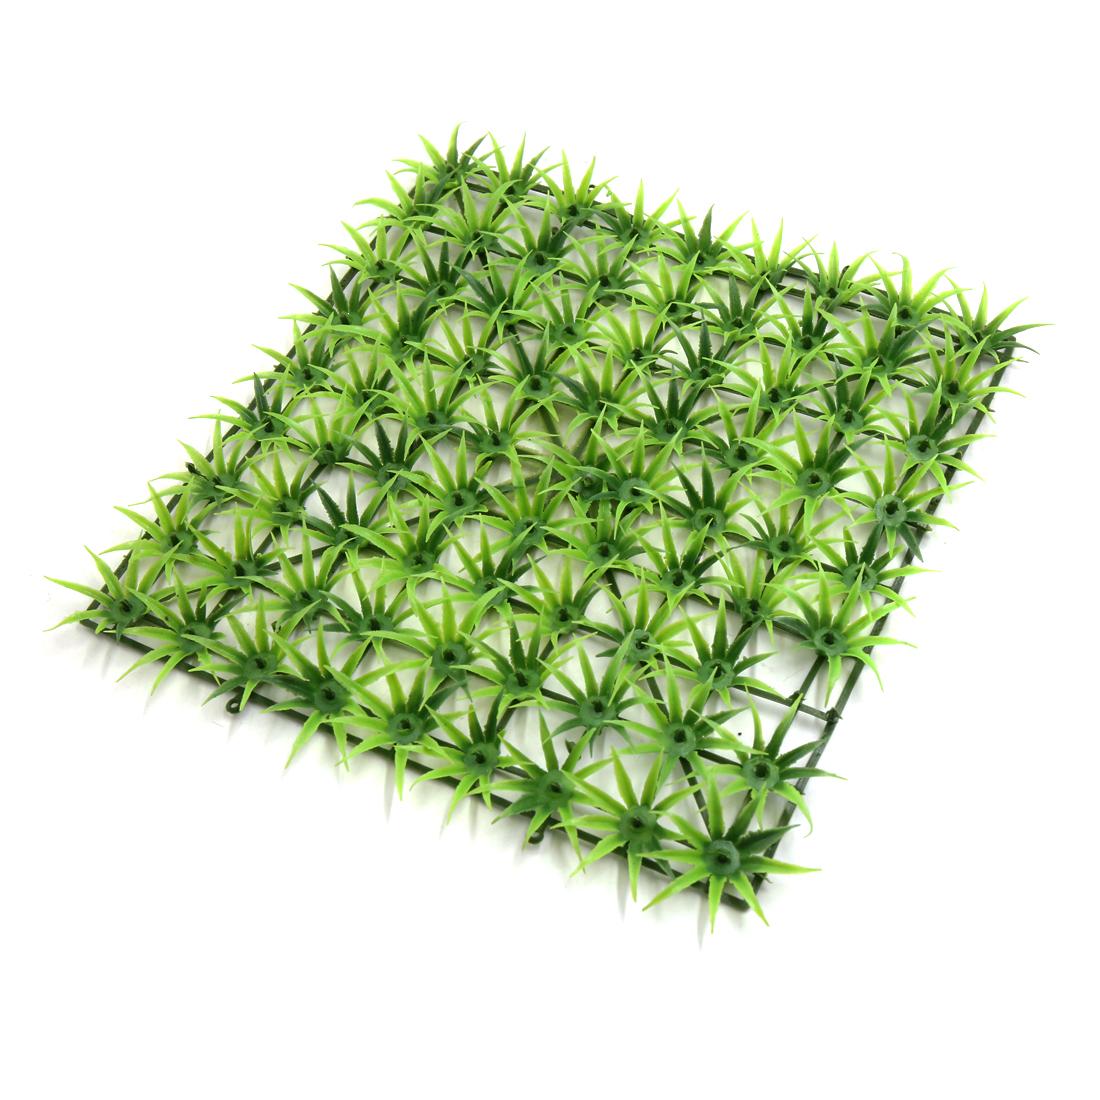 Green Plastic Grass Lawn Aquarium Tank Underwater Aquascape Ornament